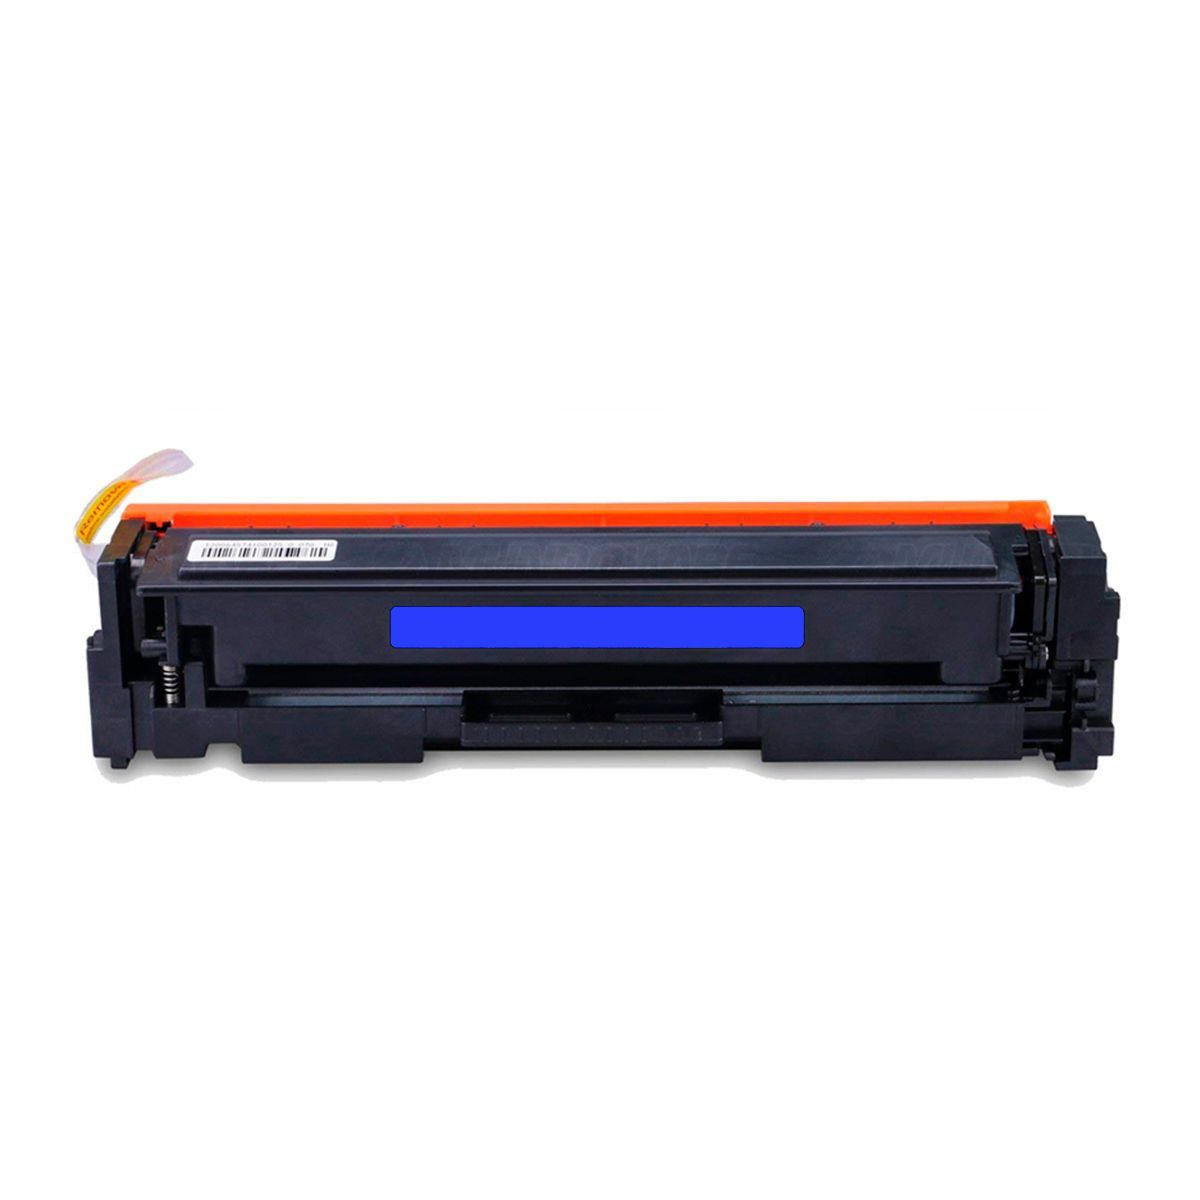 Compatível: Toner CF501A 501A 202A para impressora HP M281nw M281fdn M281fdw M280nw M254dn M254dw M254nw / Ciano / 1.300